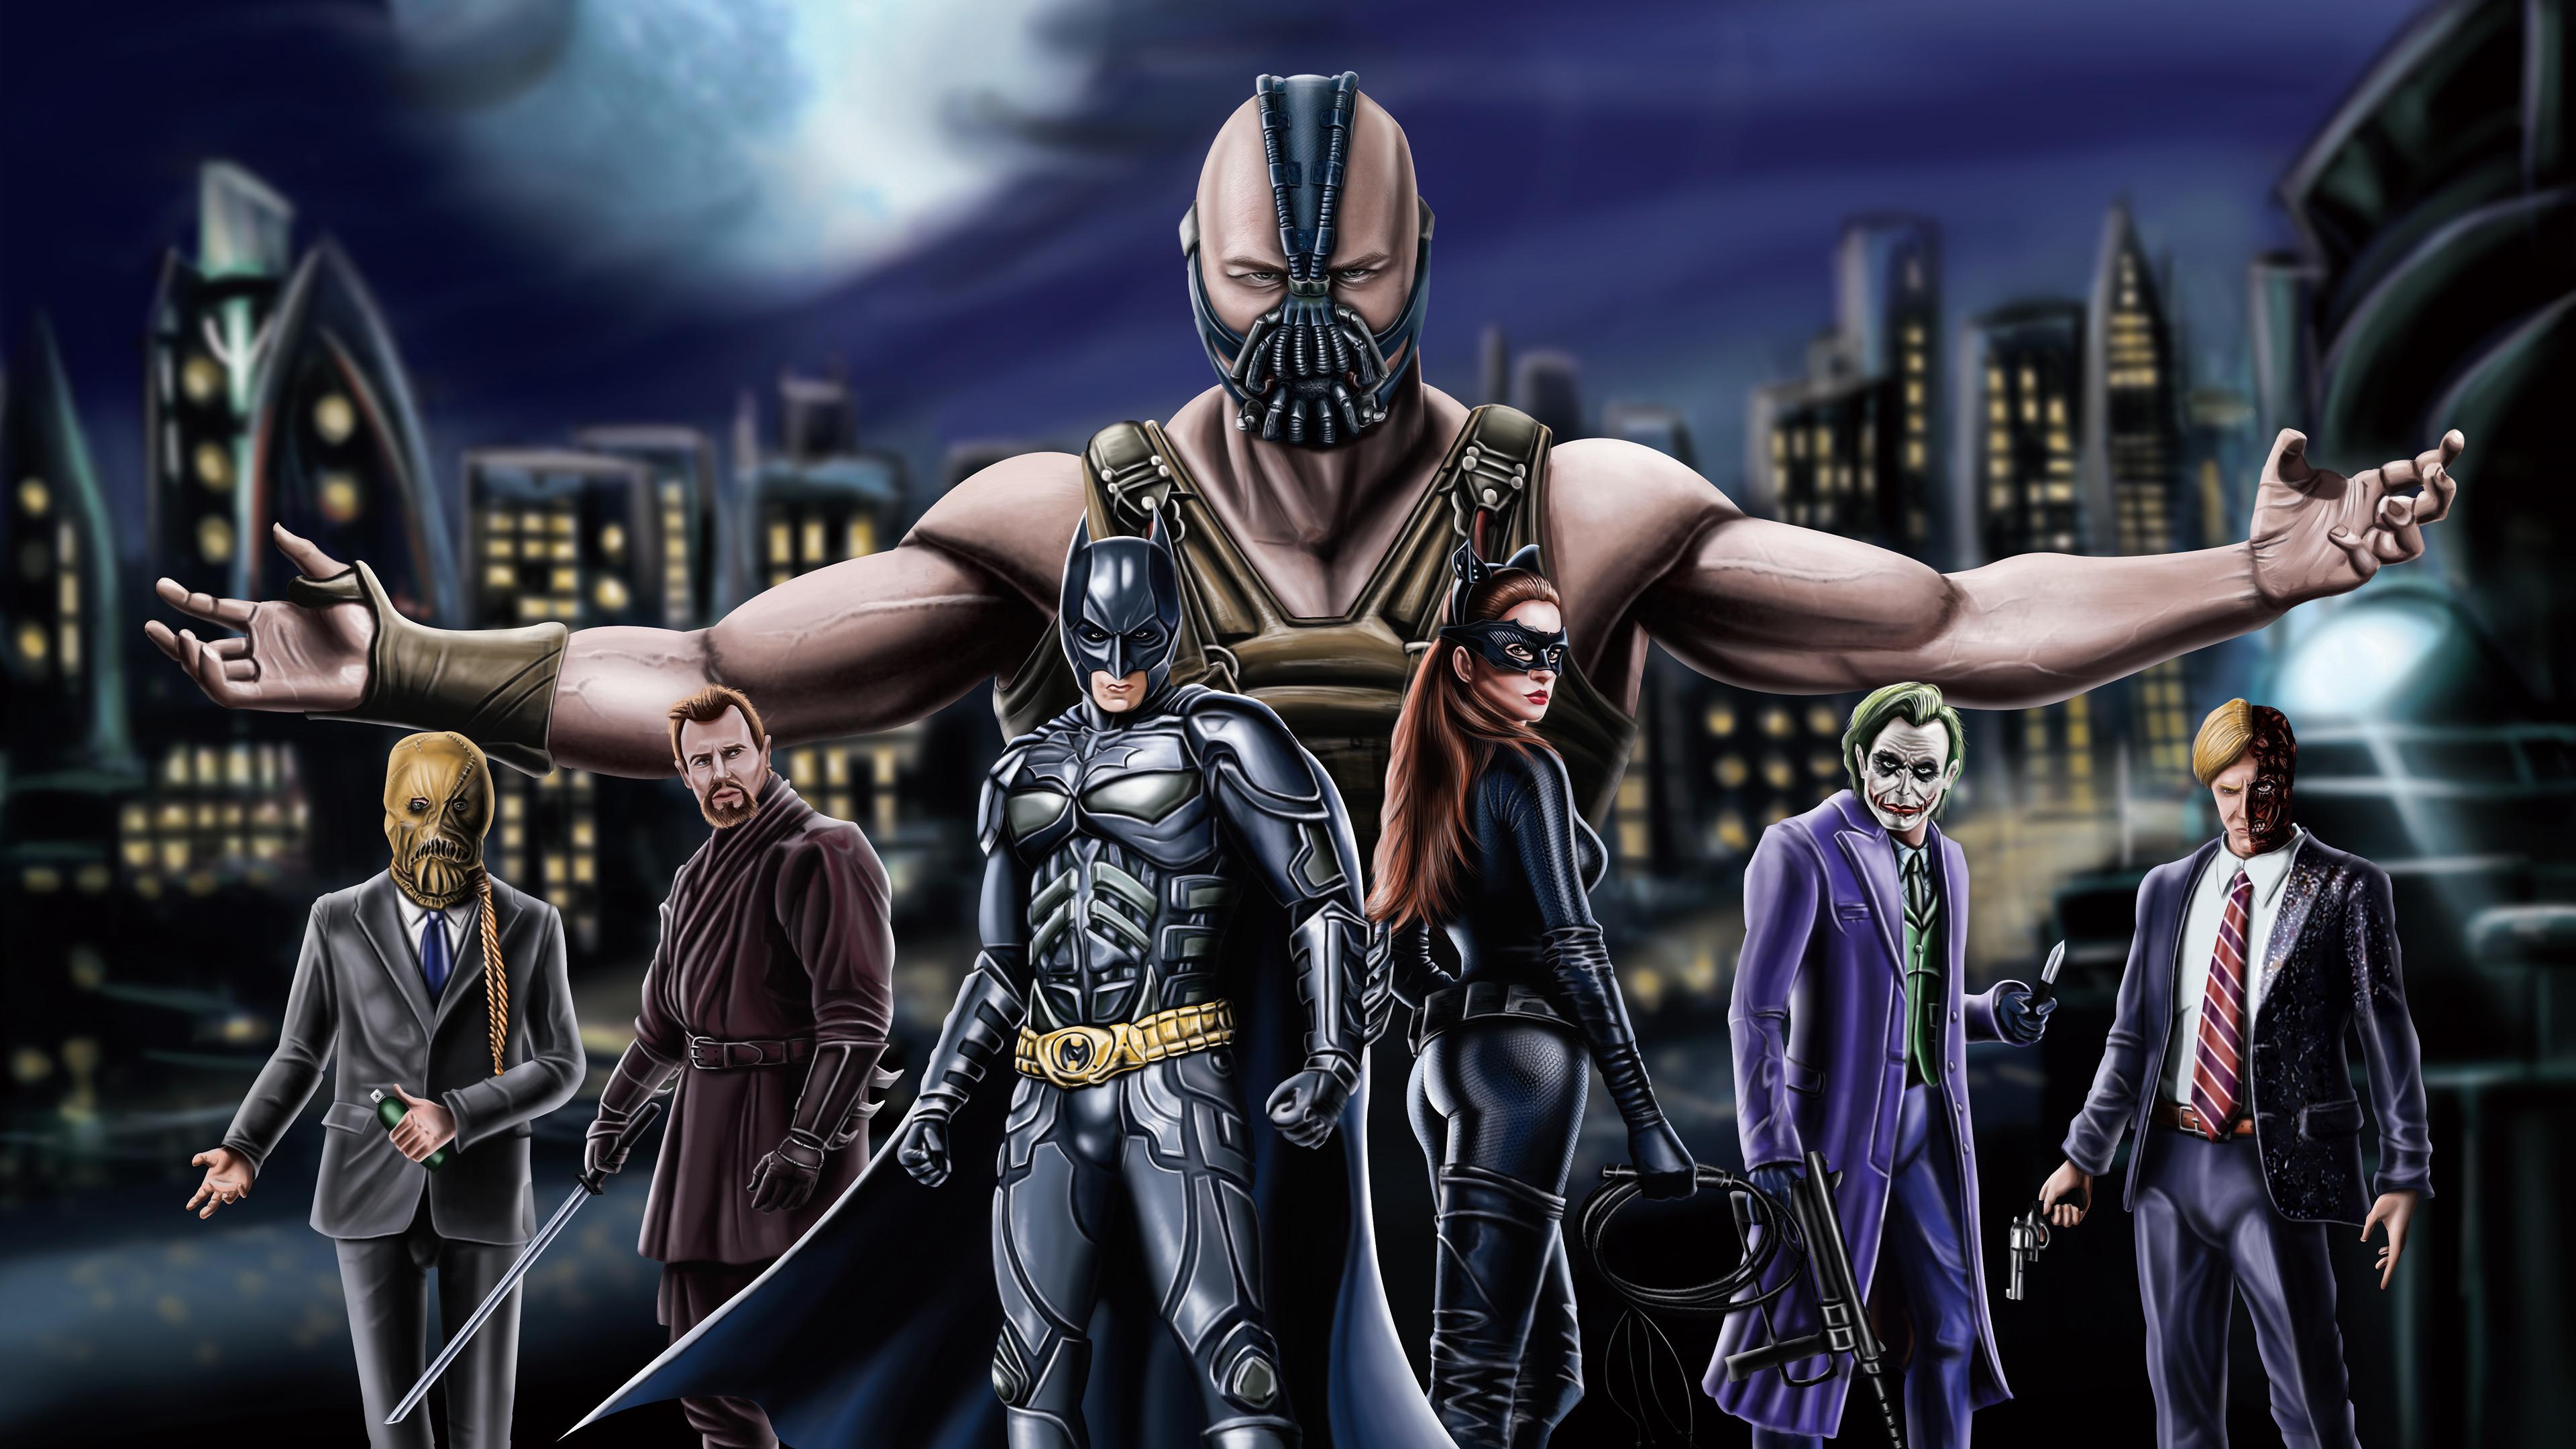 Wallpaper 4k The Dark Knight Trilogy Artwork 4k 4k Wallpapers